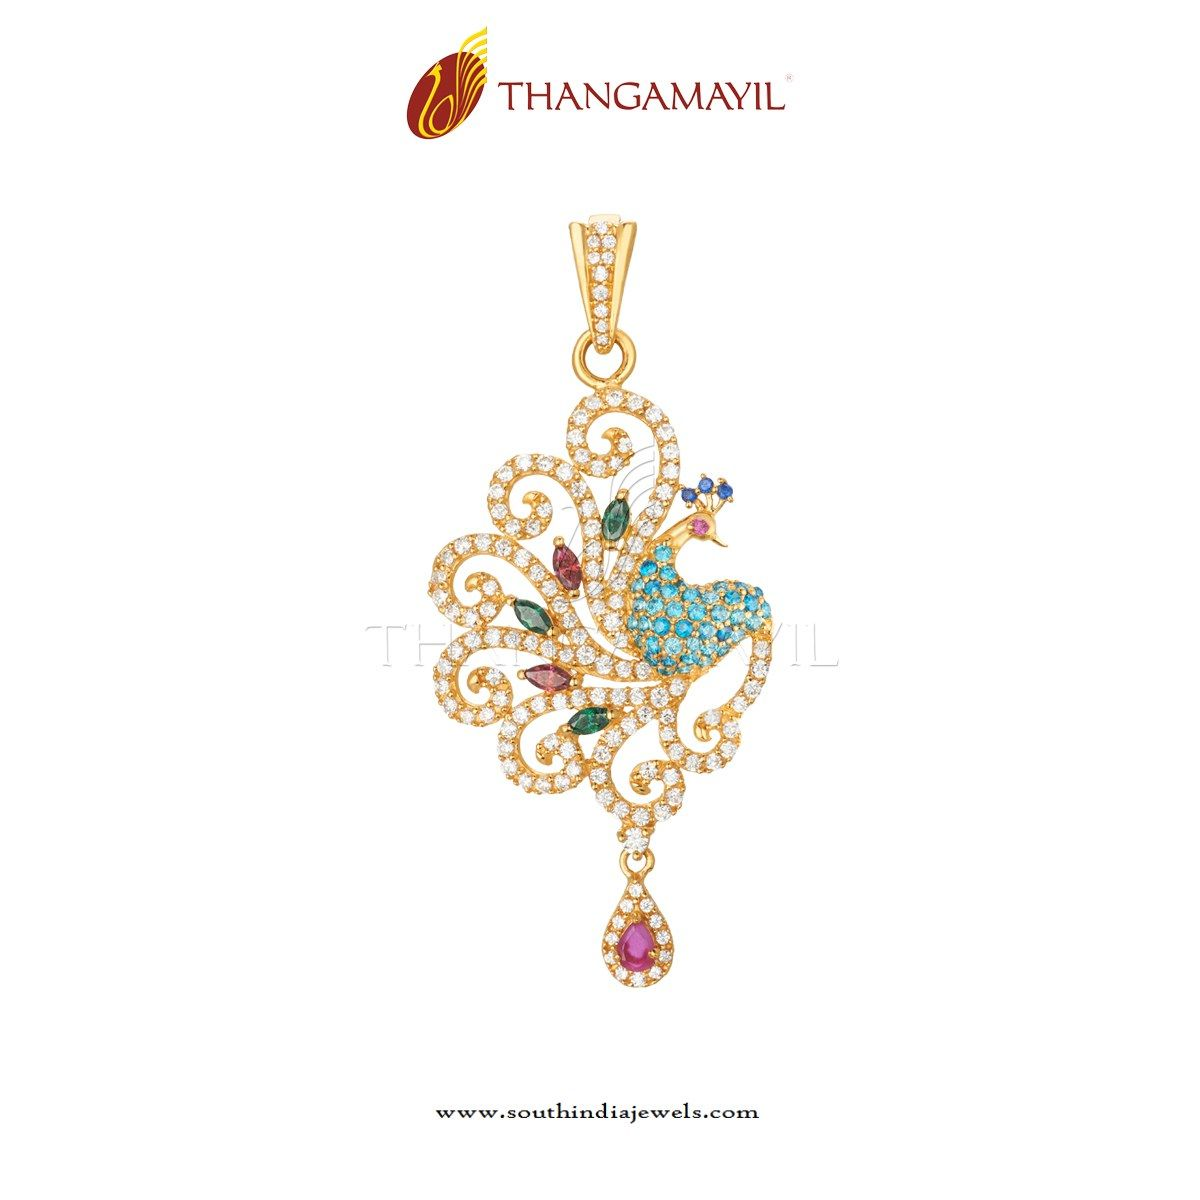 Latest Gold CZ Stone Pendant | Stone pendants, South india and Ear ...